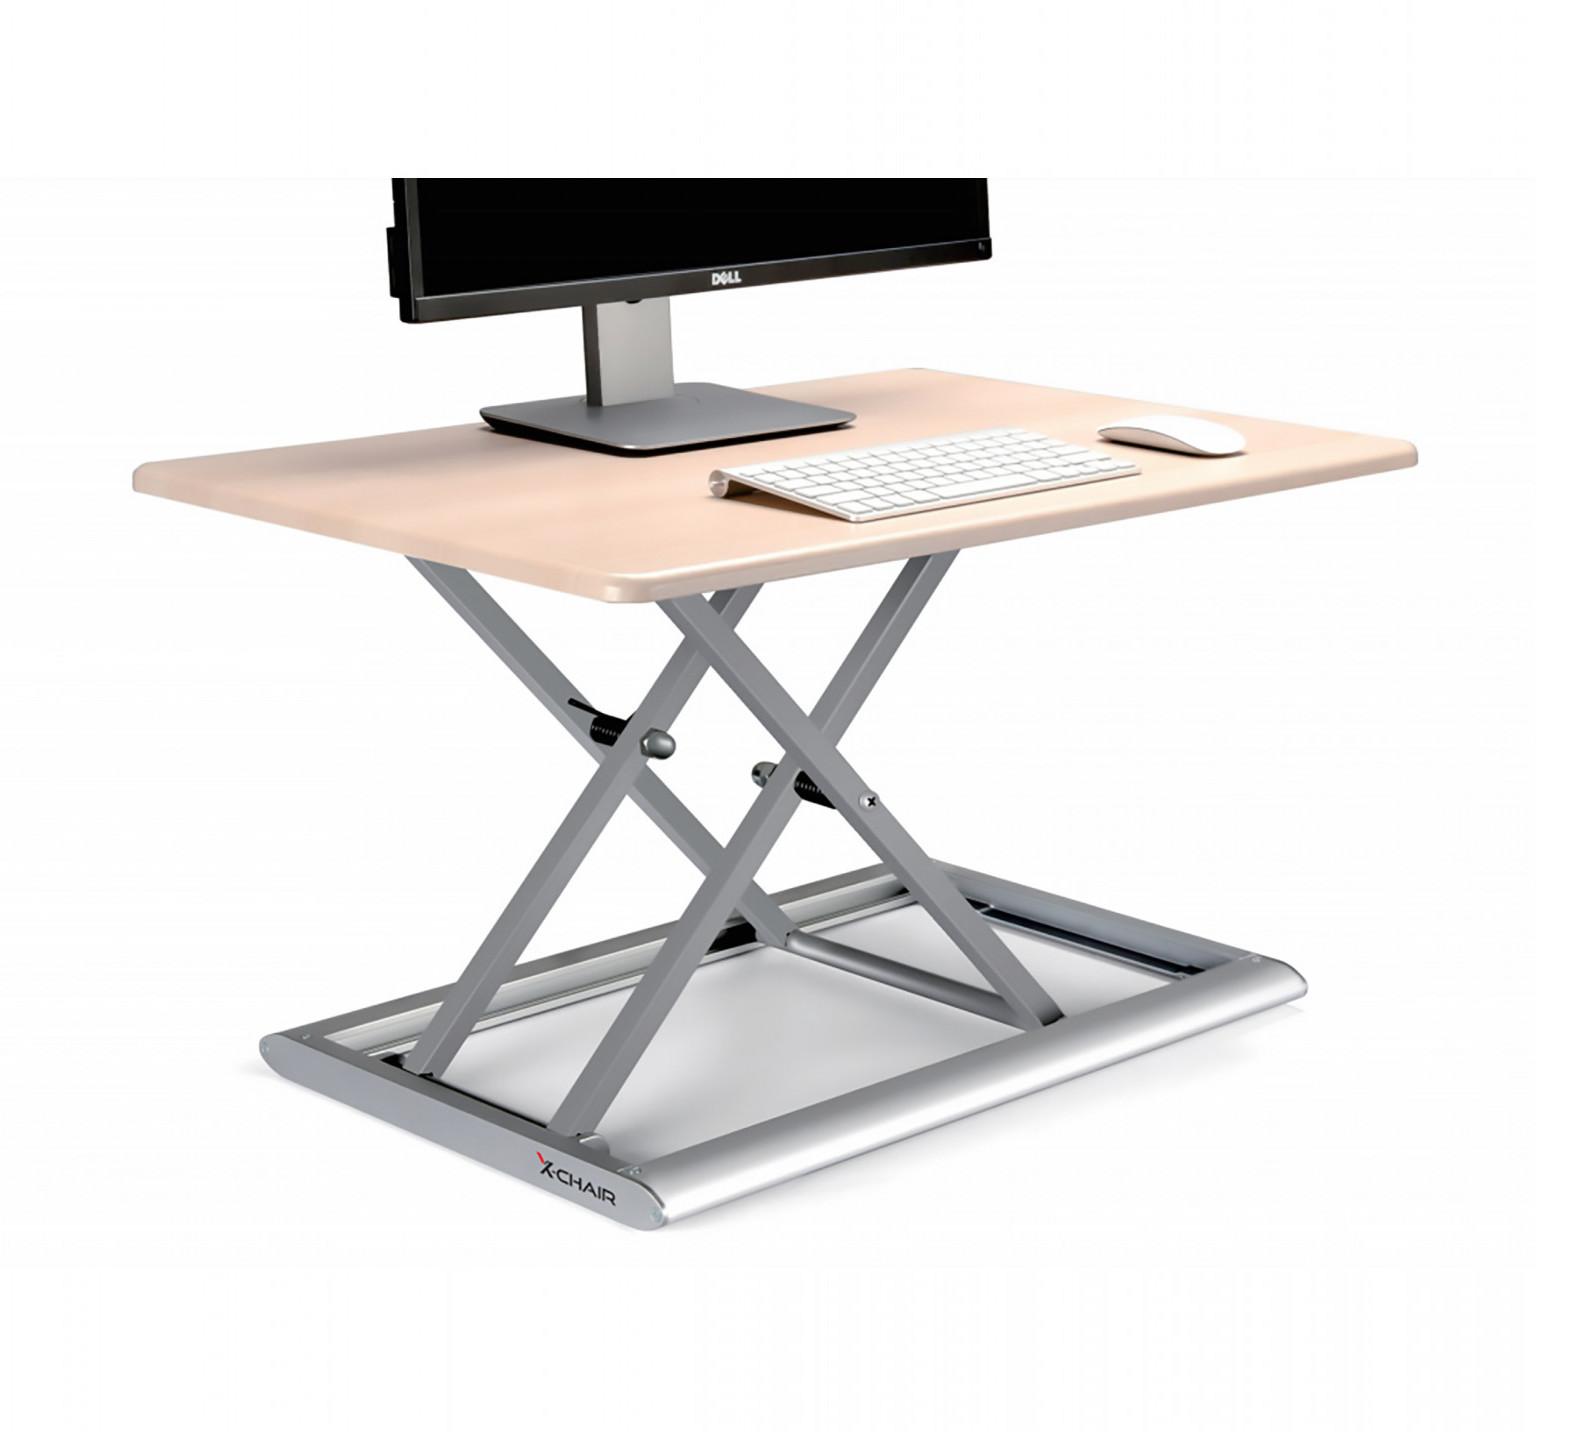 x-flextop portable sit to stand desk in birch